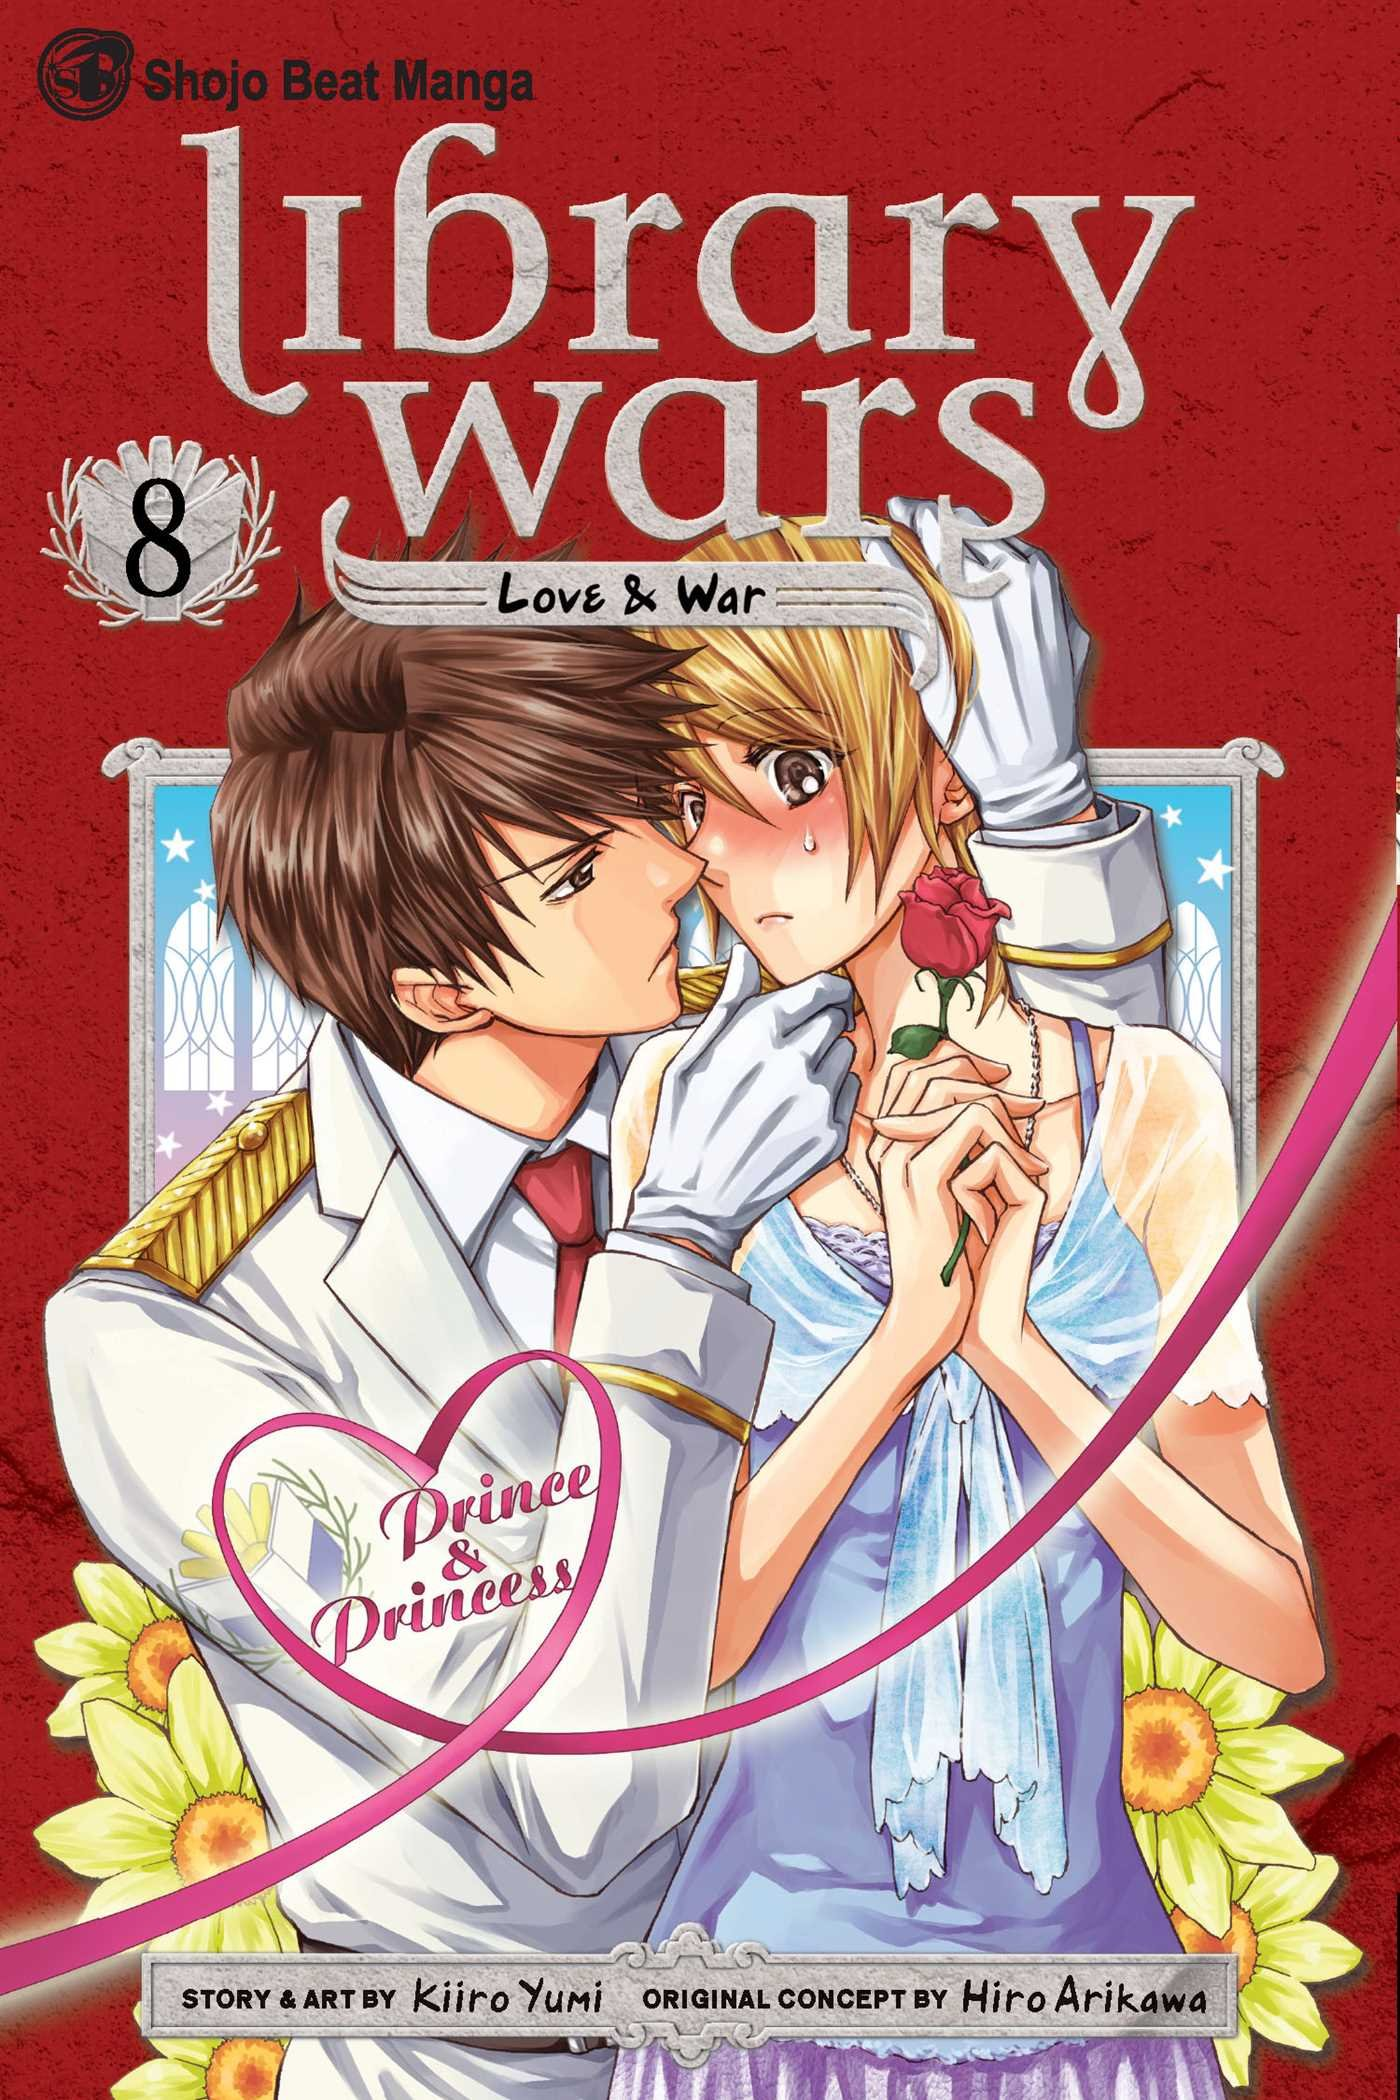 Download Library Wars: Love & War, Vol. 8 ebook